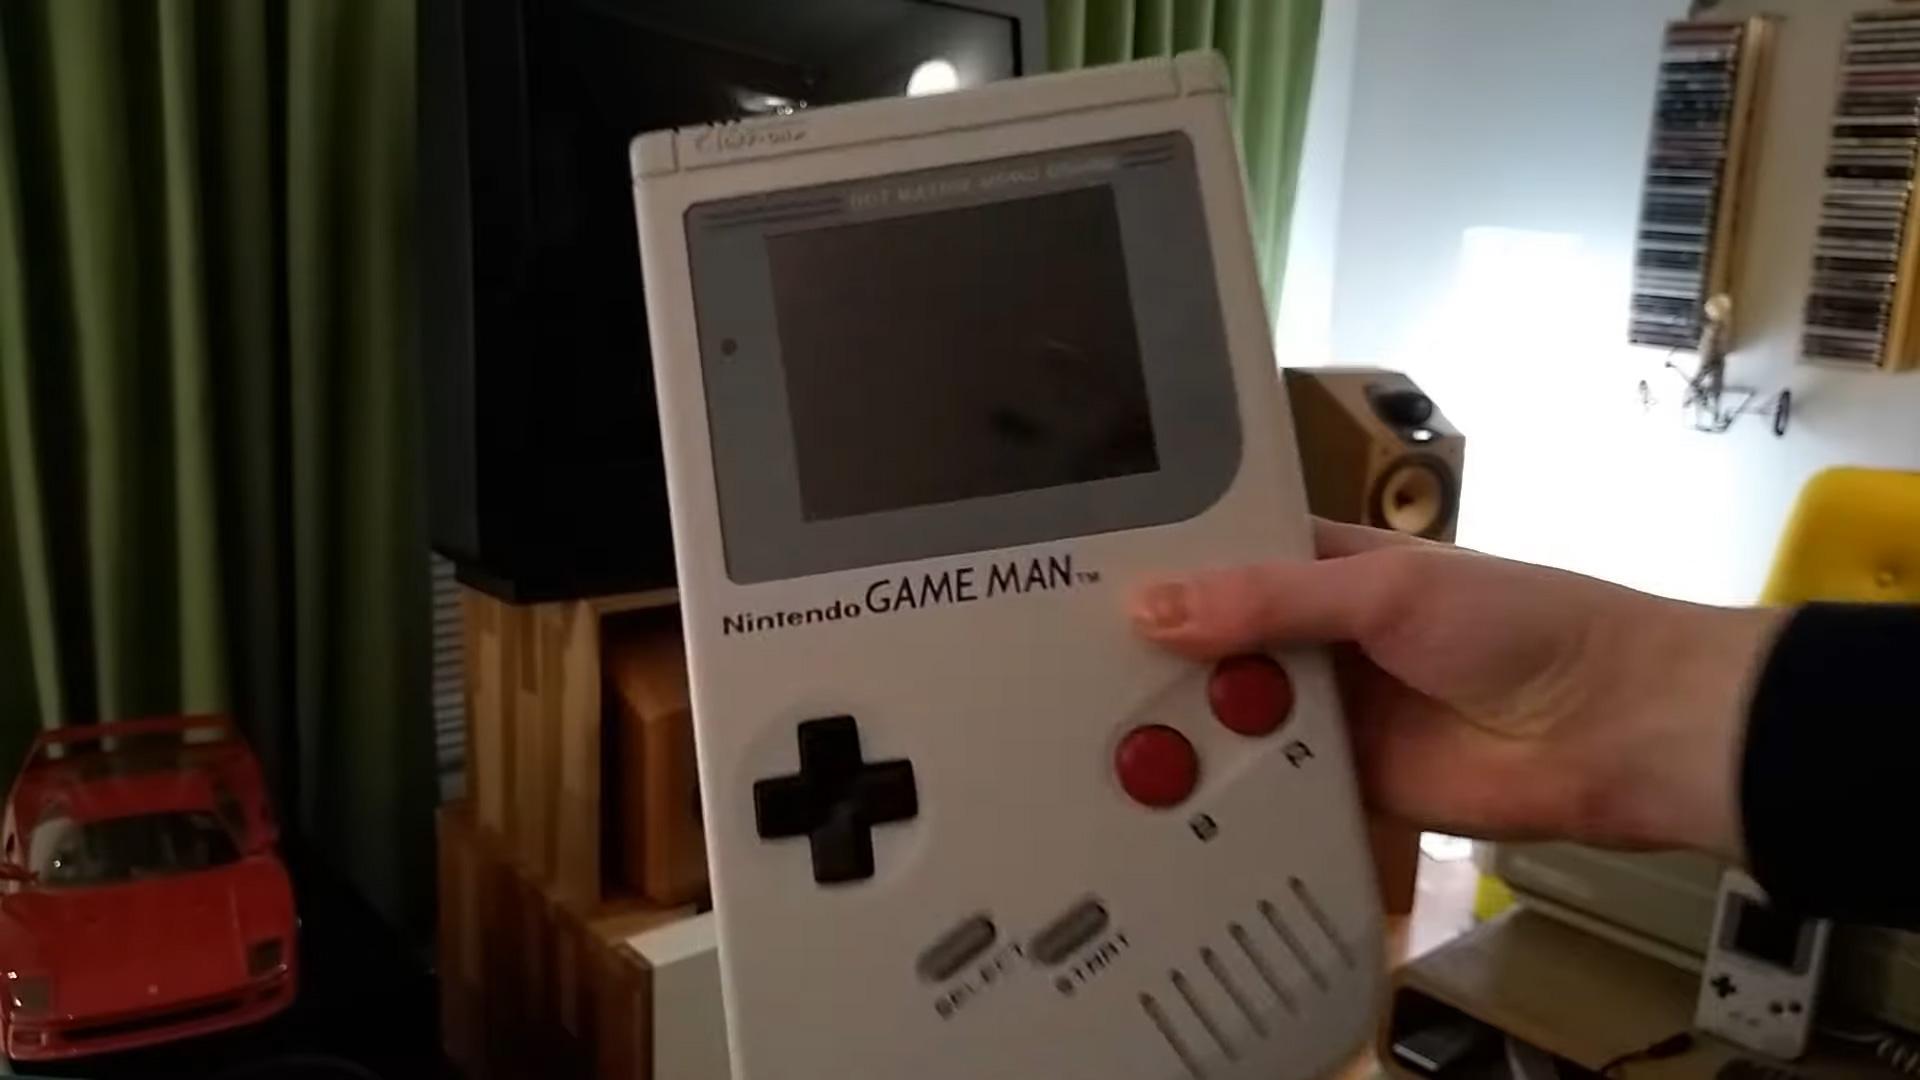 I love the absurdity of the Nintendo Game Man screenshot